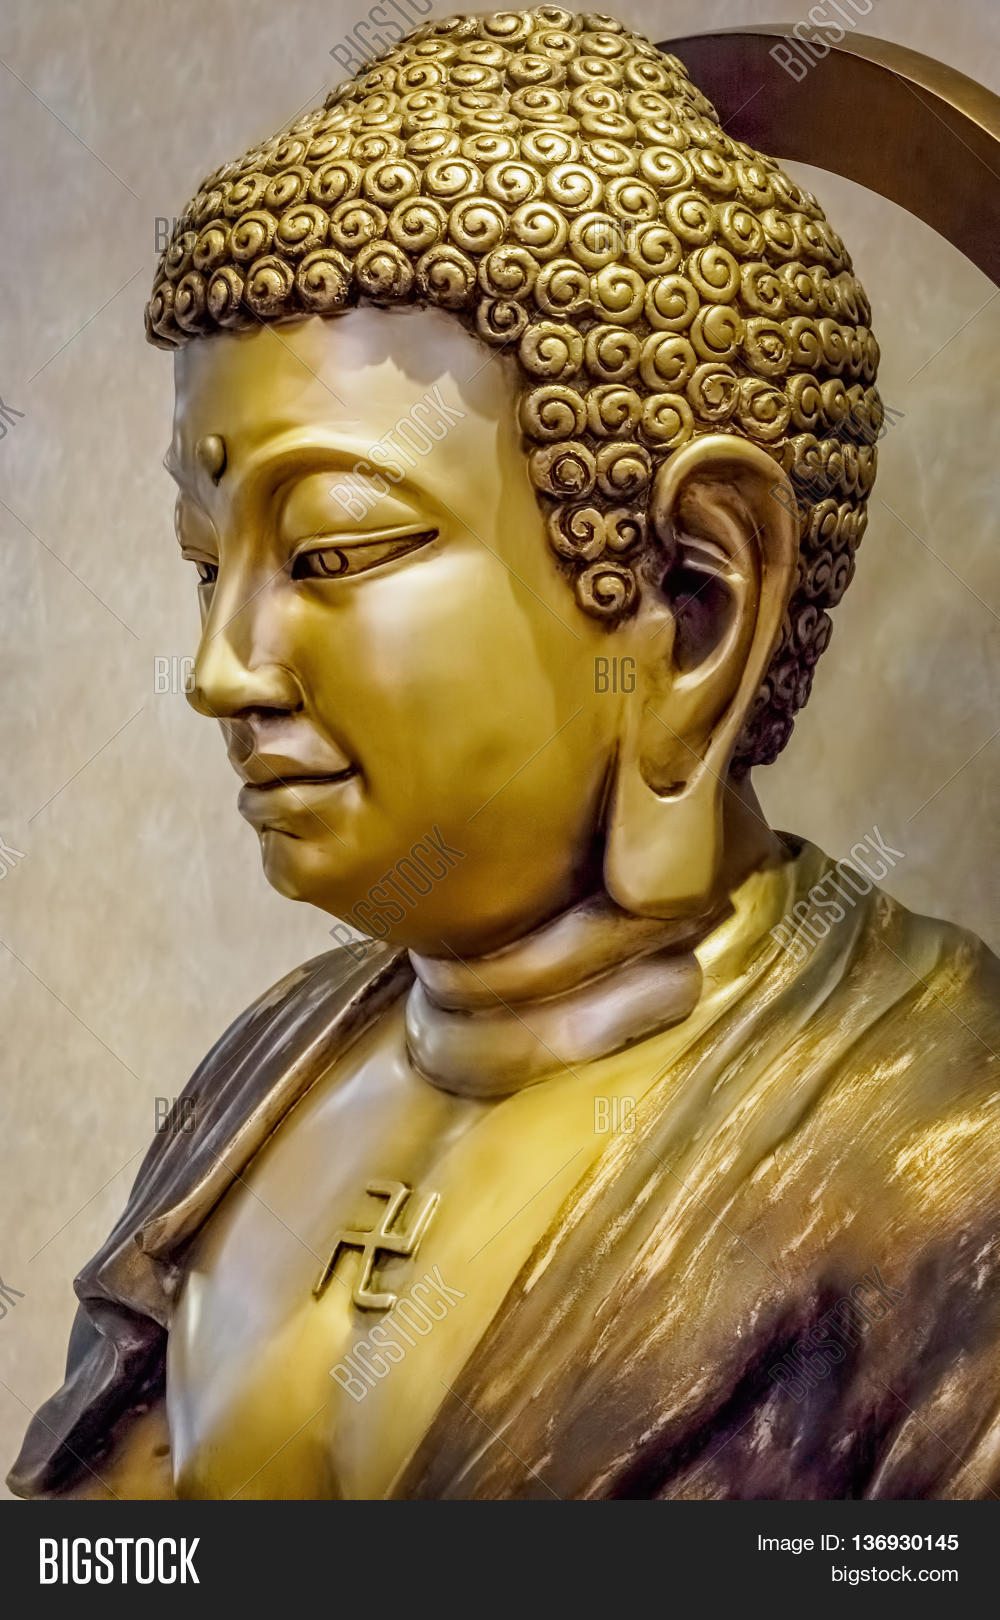 world famous gautama buddha known image amp photo bigstock